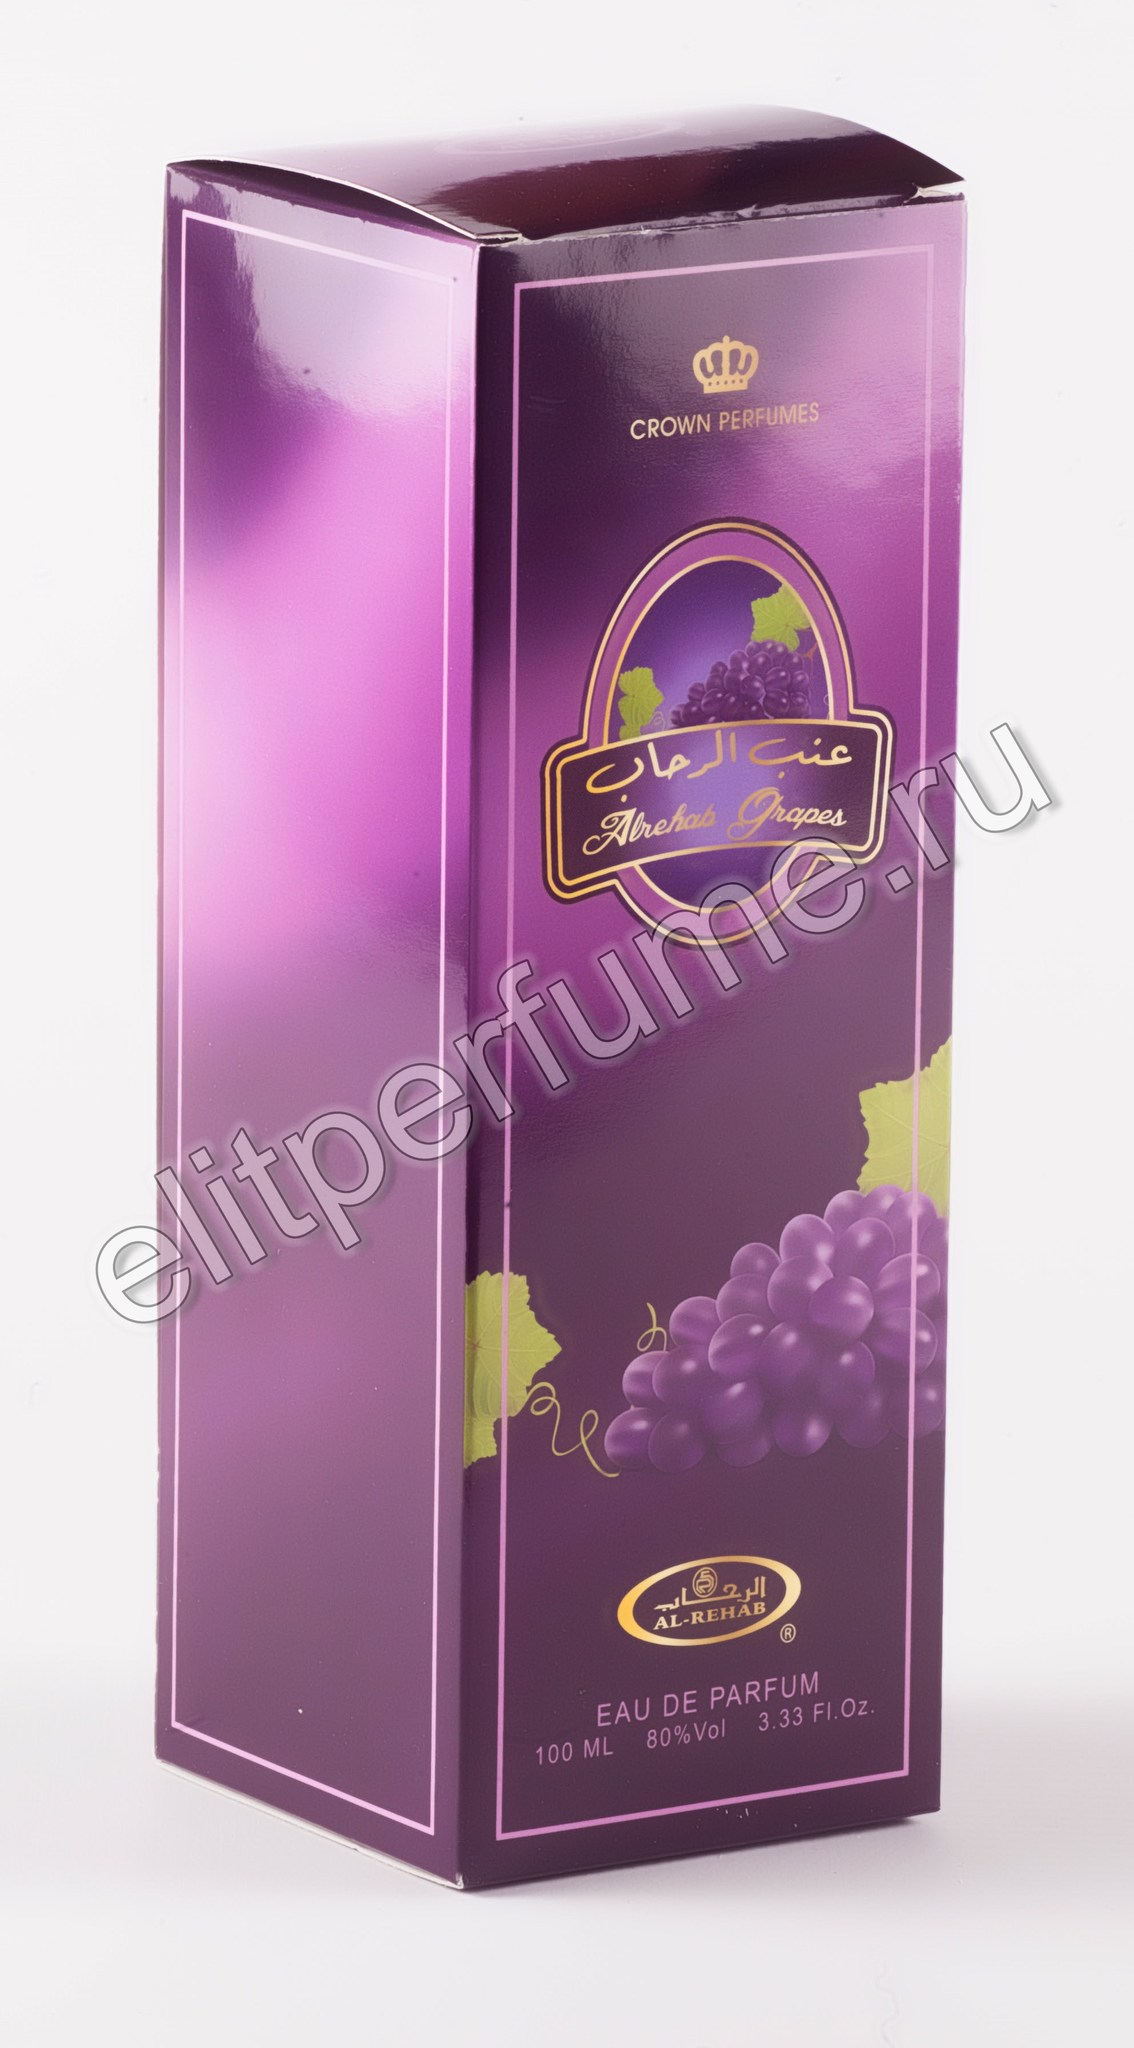 Grapes Грейпс 100 мл спрей от Аль Рехаб Al Rehab